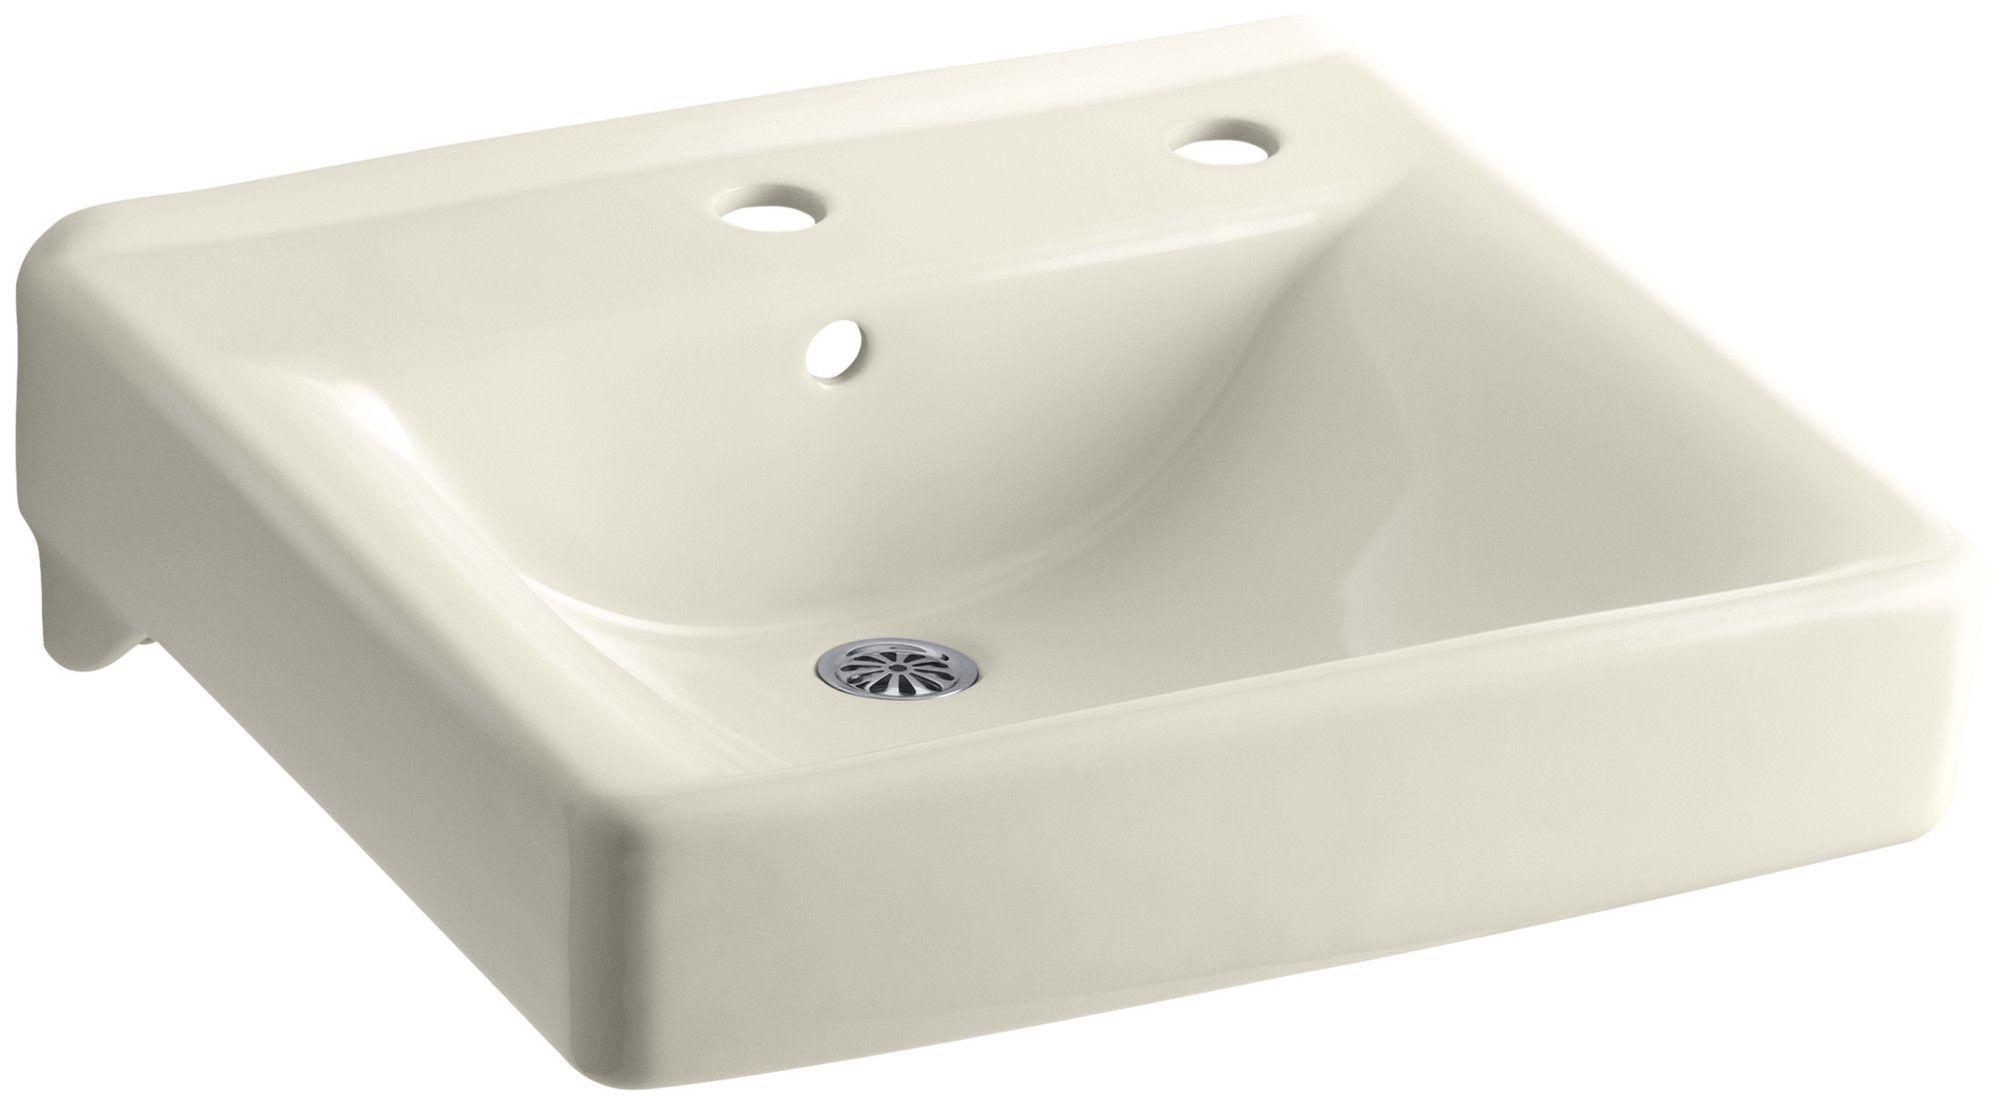 Soho Ceramic 20 Wall Mount Bathroom Sink With Overflow